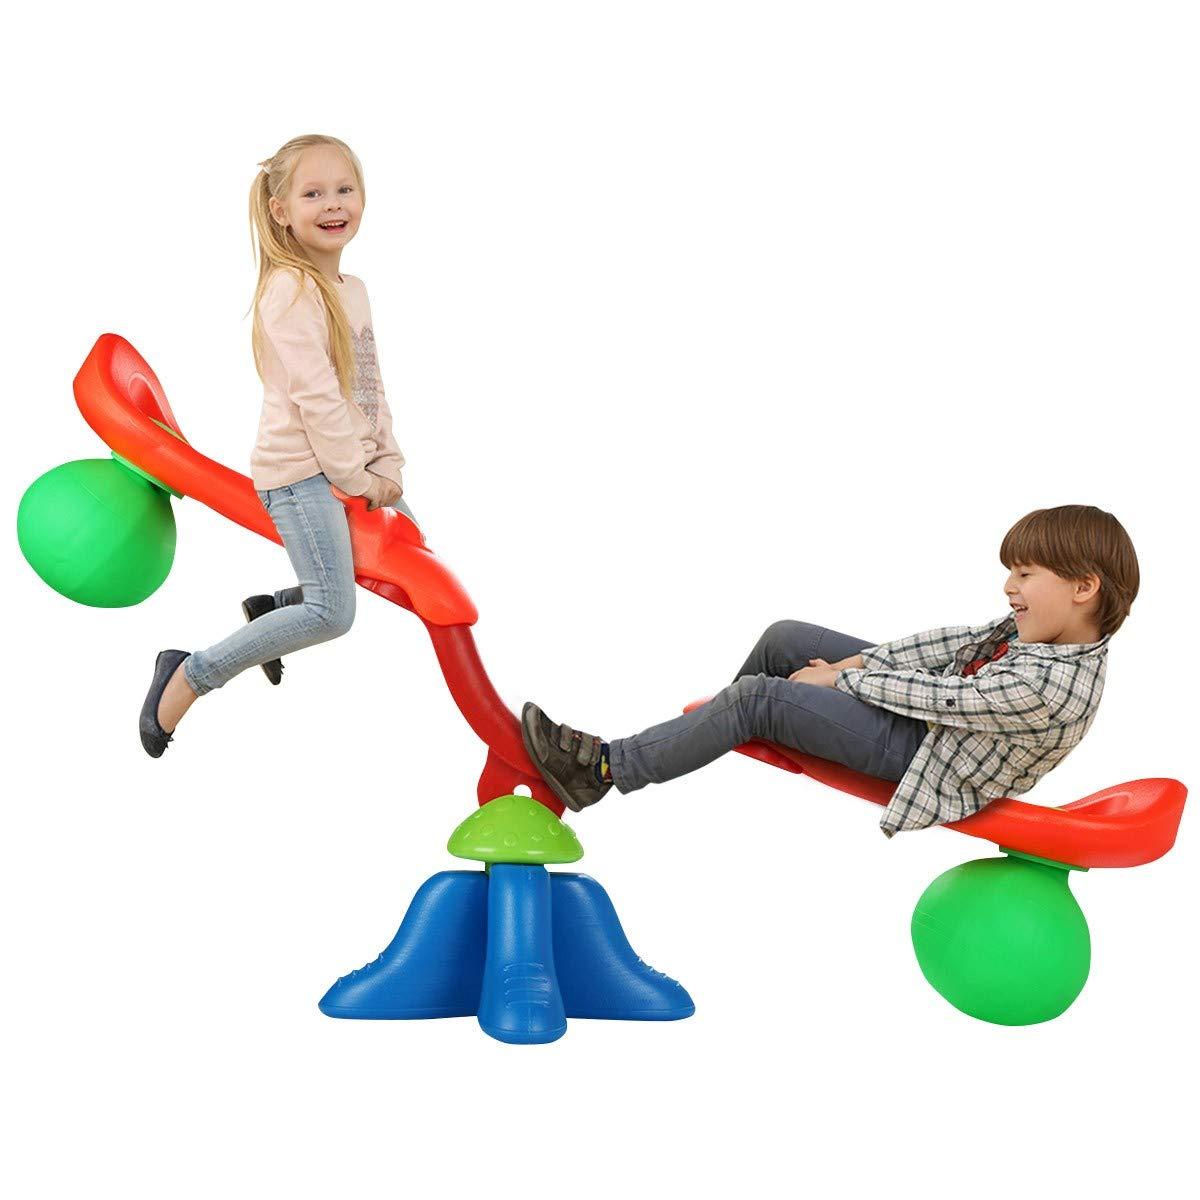 Abbeydh Kids Seesaw 360 Degree Spinning Teeter by Abbeydh